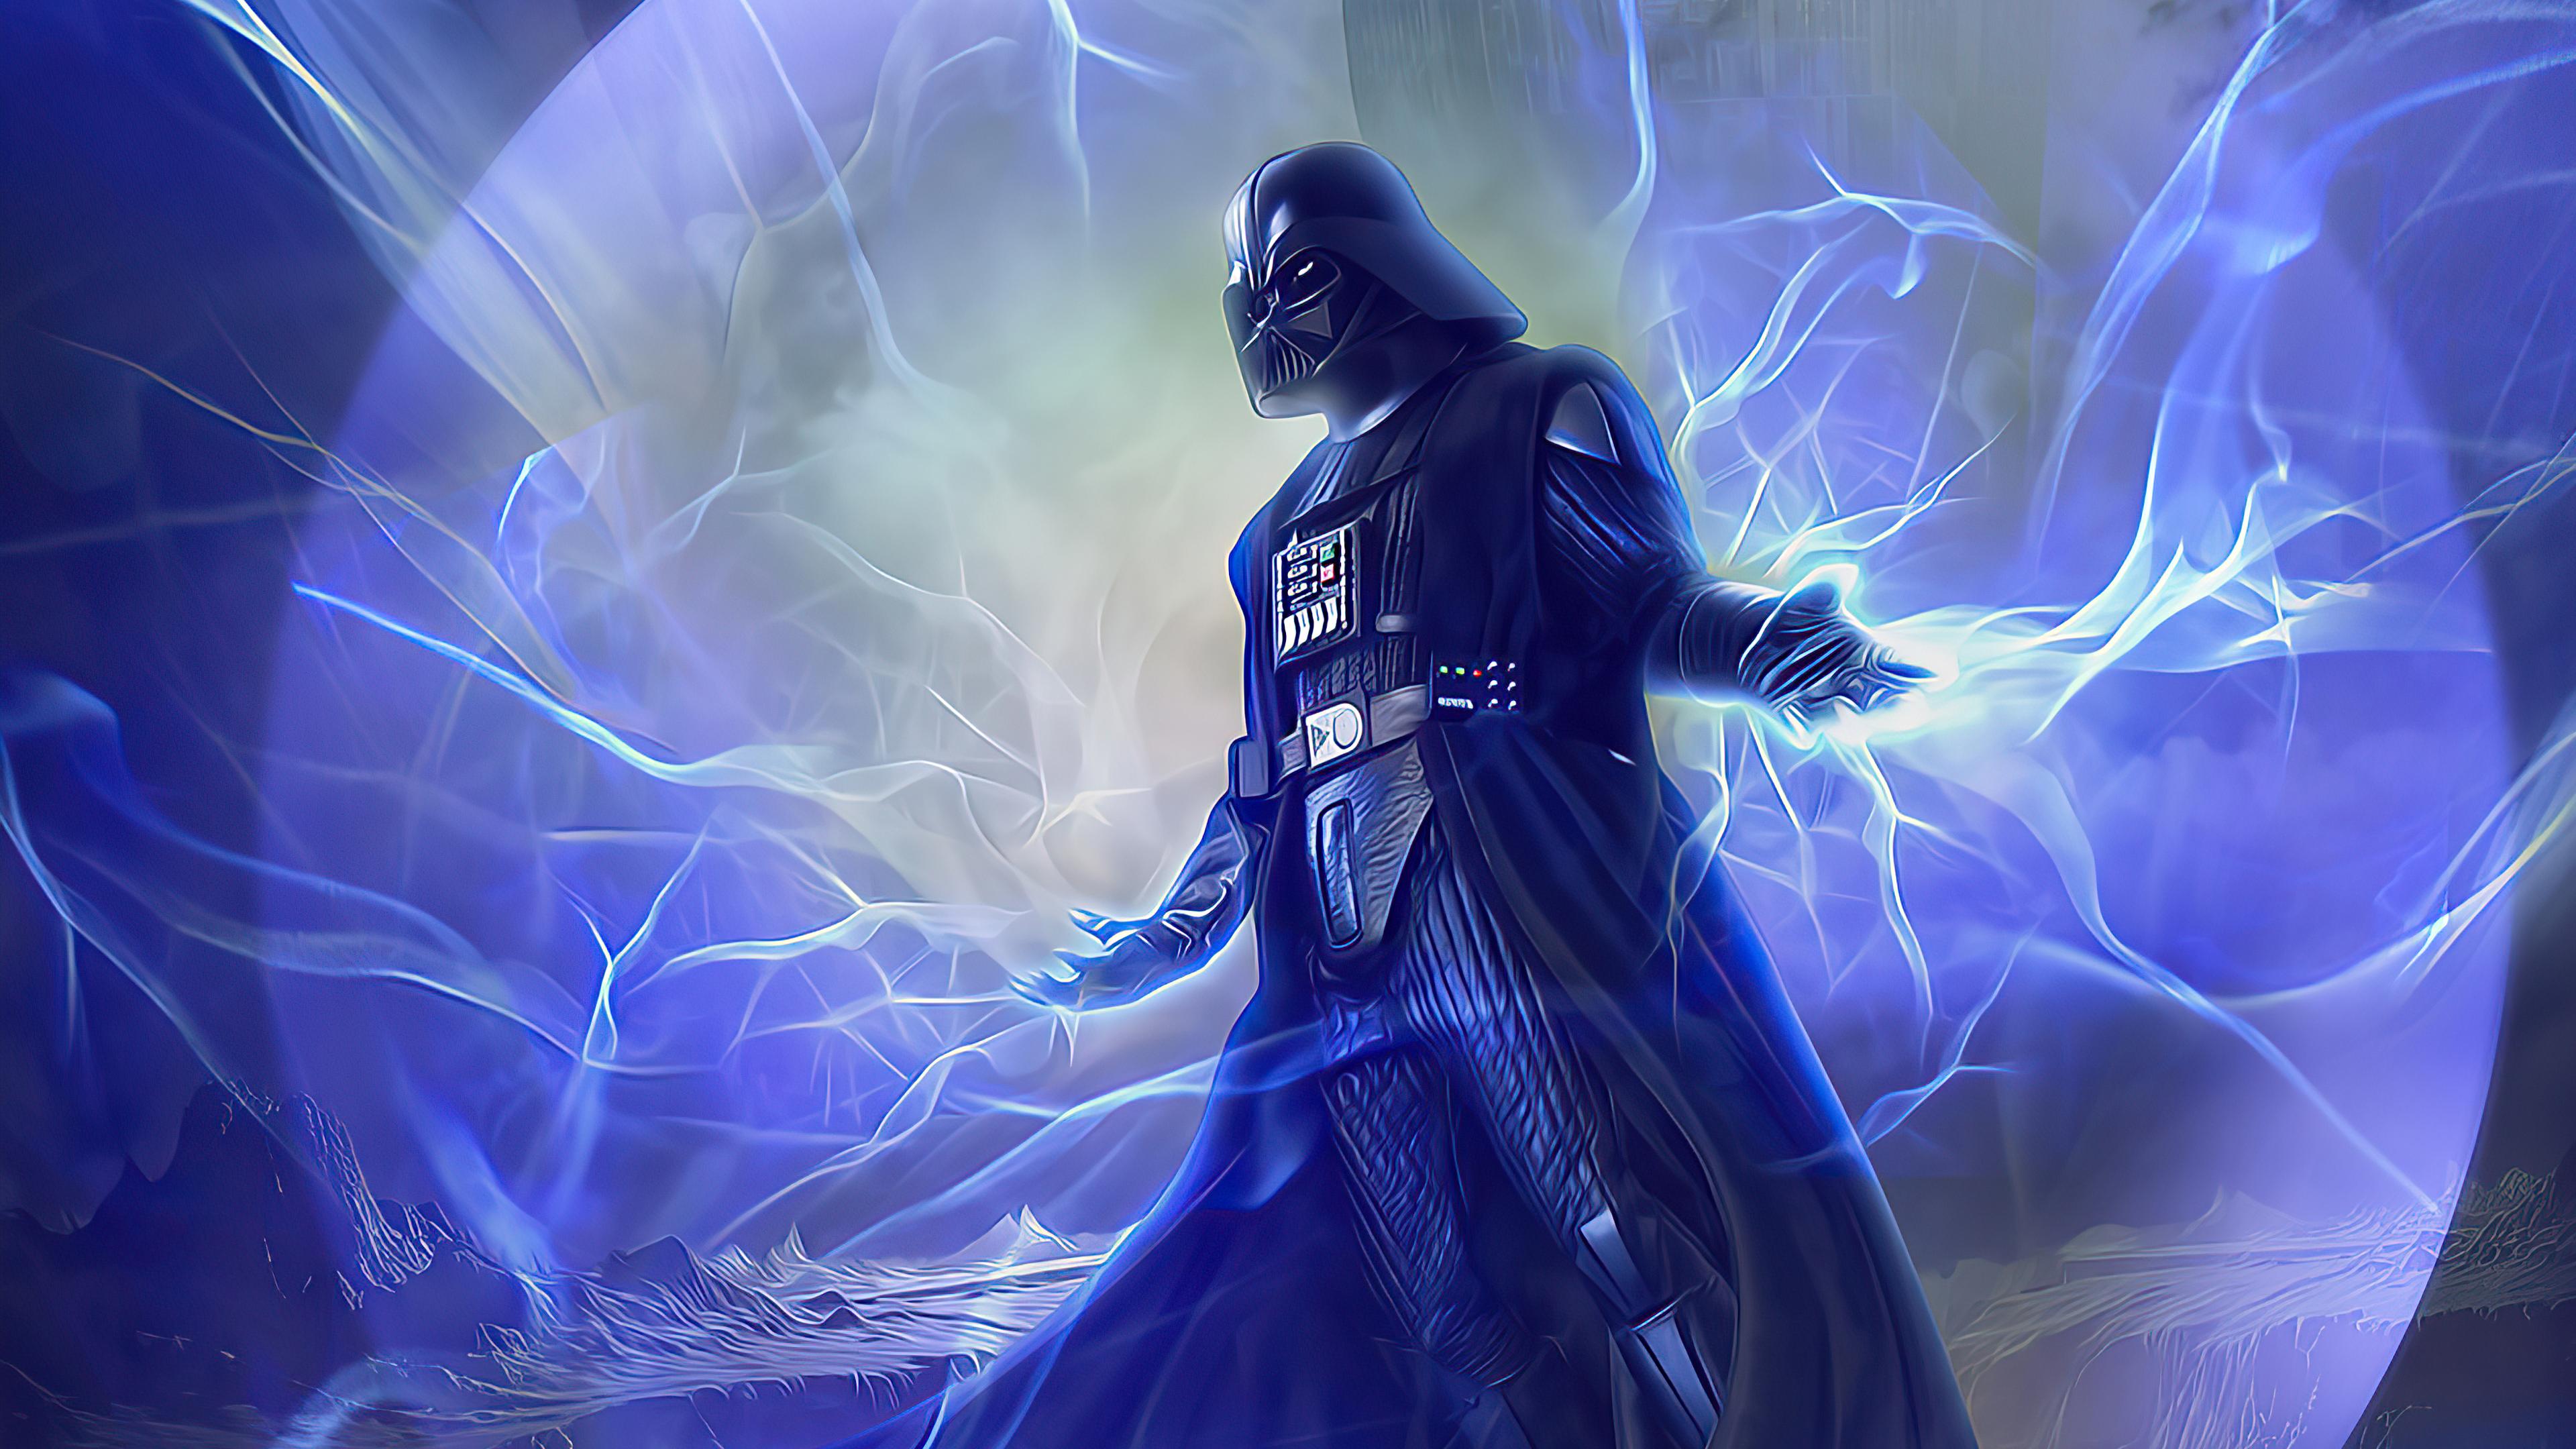 Darth Vader 2020 Artwork, HD Movies, 4k Wallpapers, Images ...